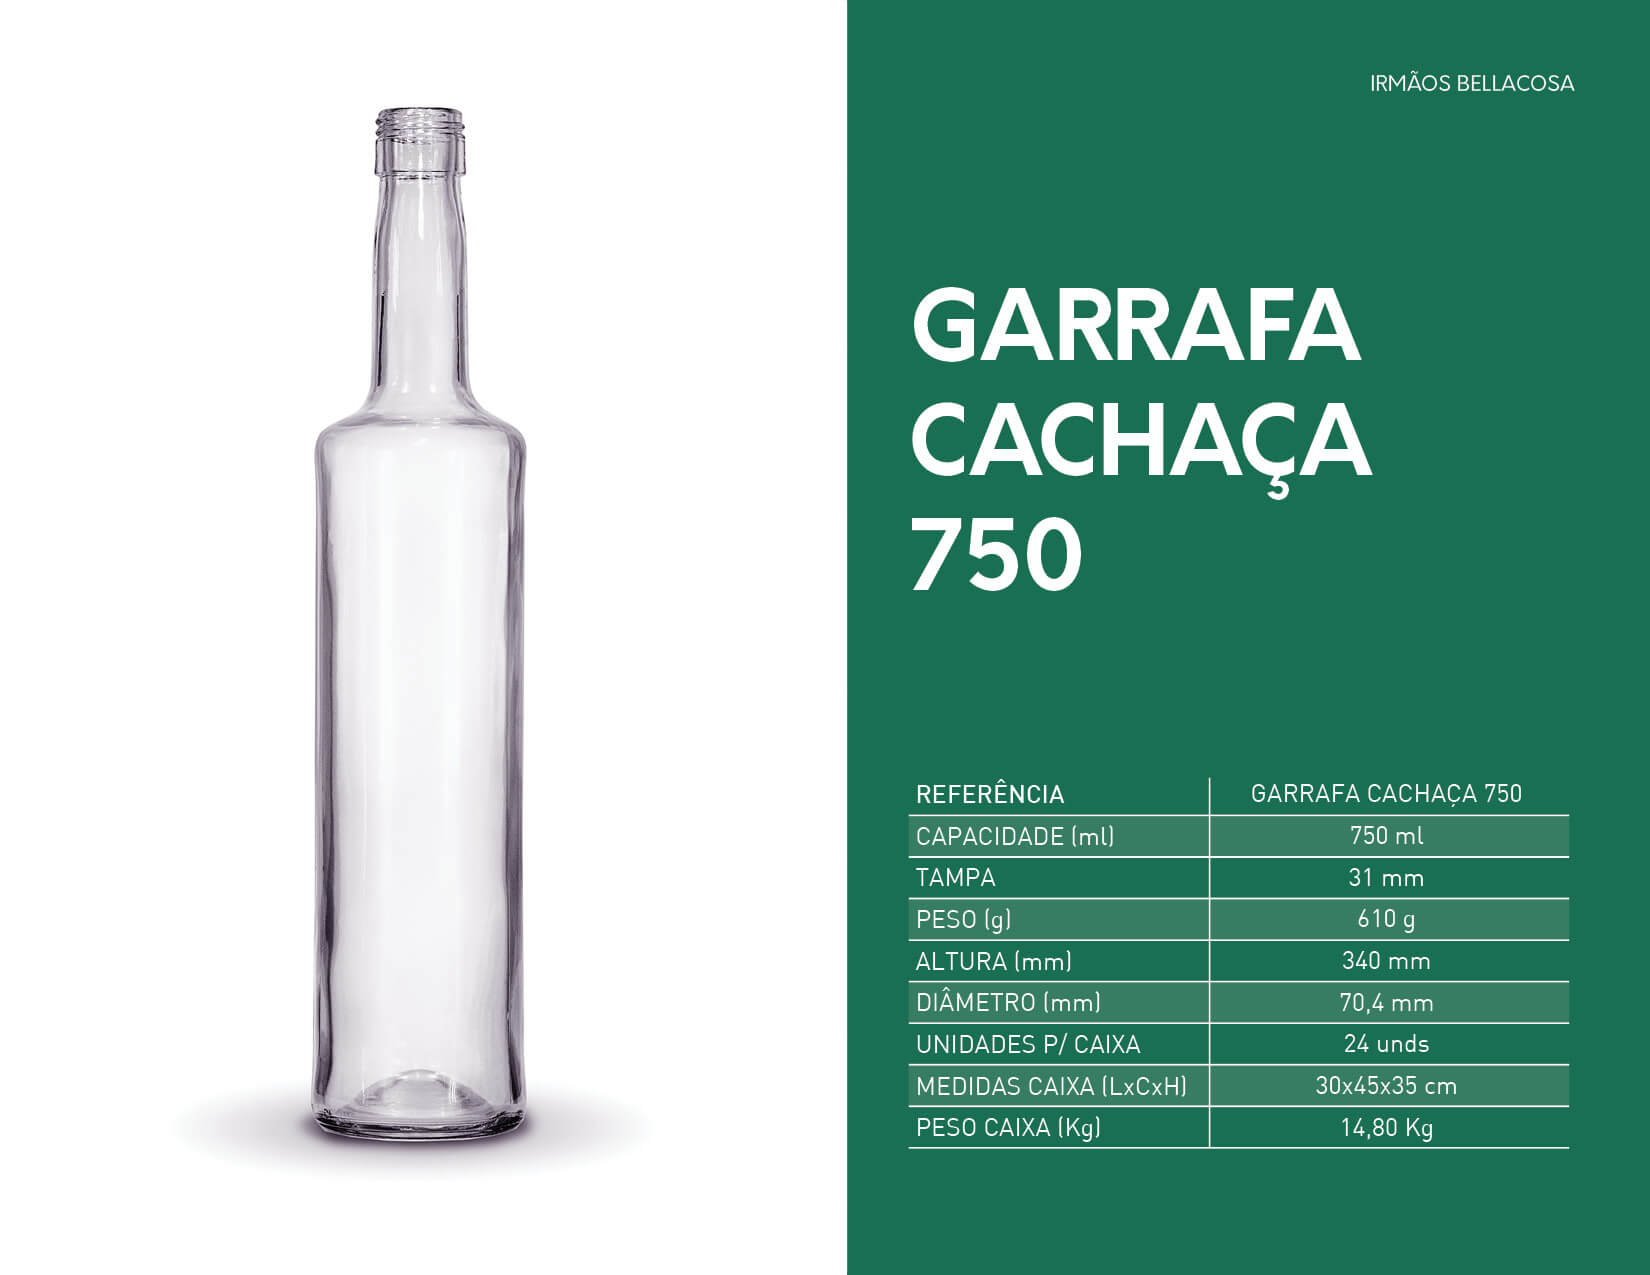 050-Garrafa-cachaca-750-irmaos-bellacosa-embalagens-de-vidro